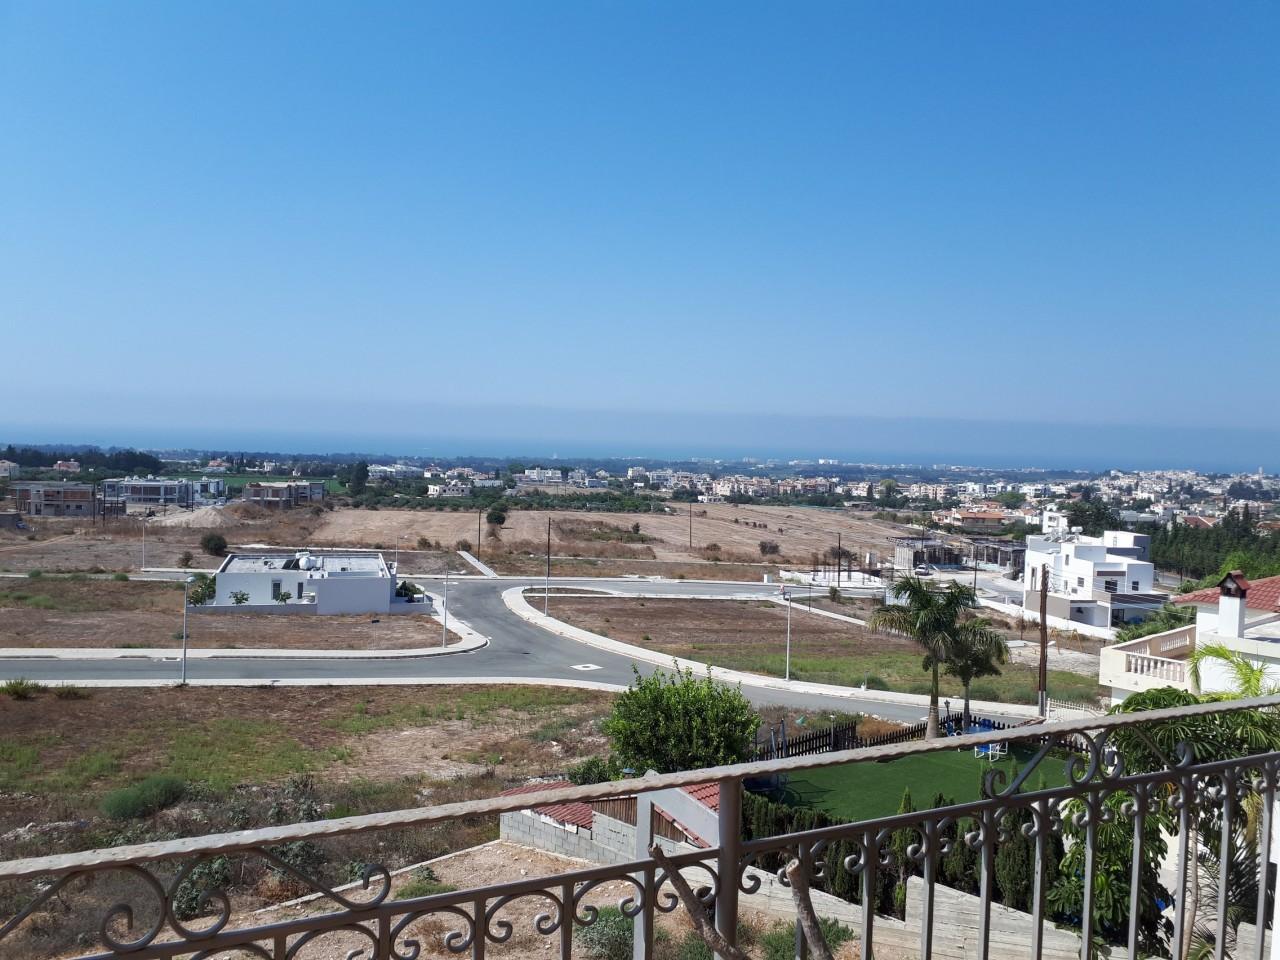 House (Detached) in Geroskipou, Paphos for Sale  6 Bedrooms.....